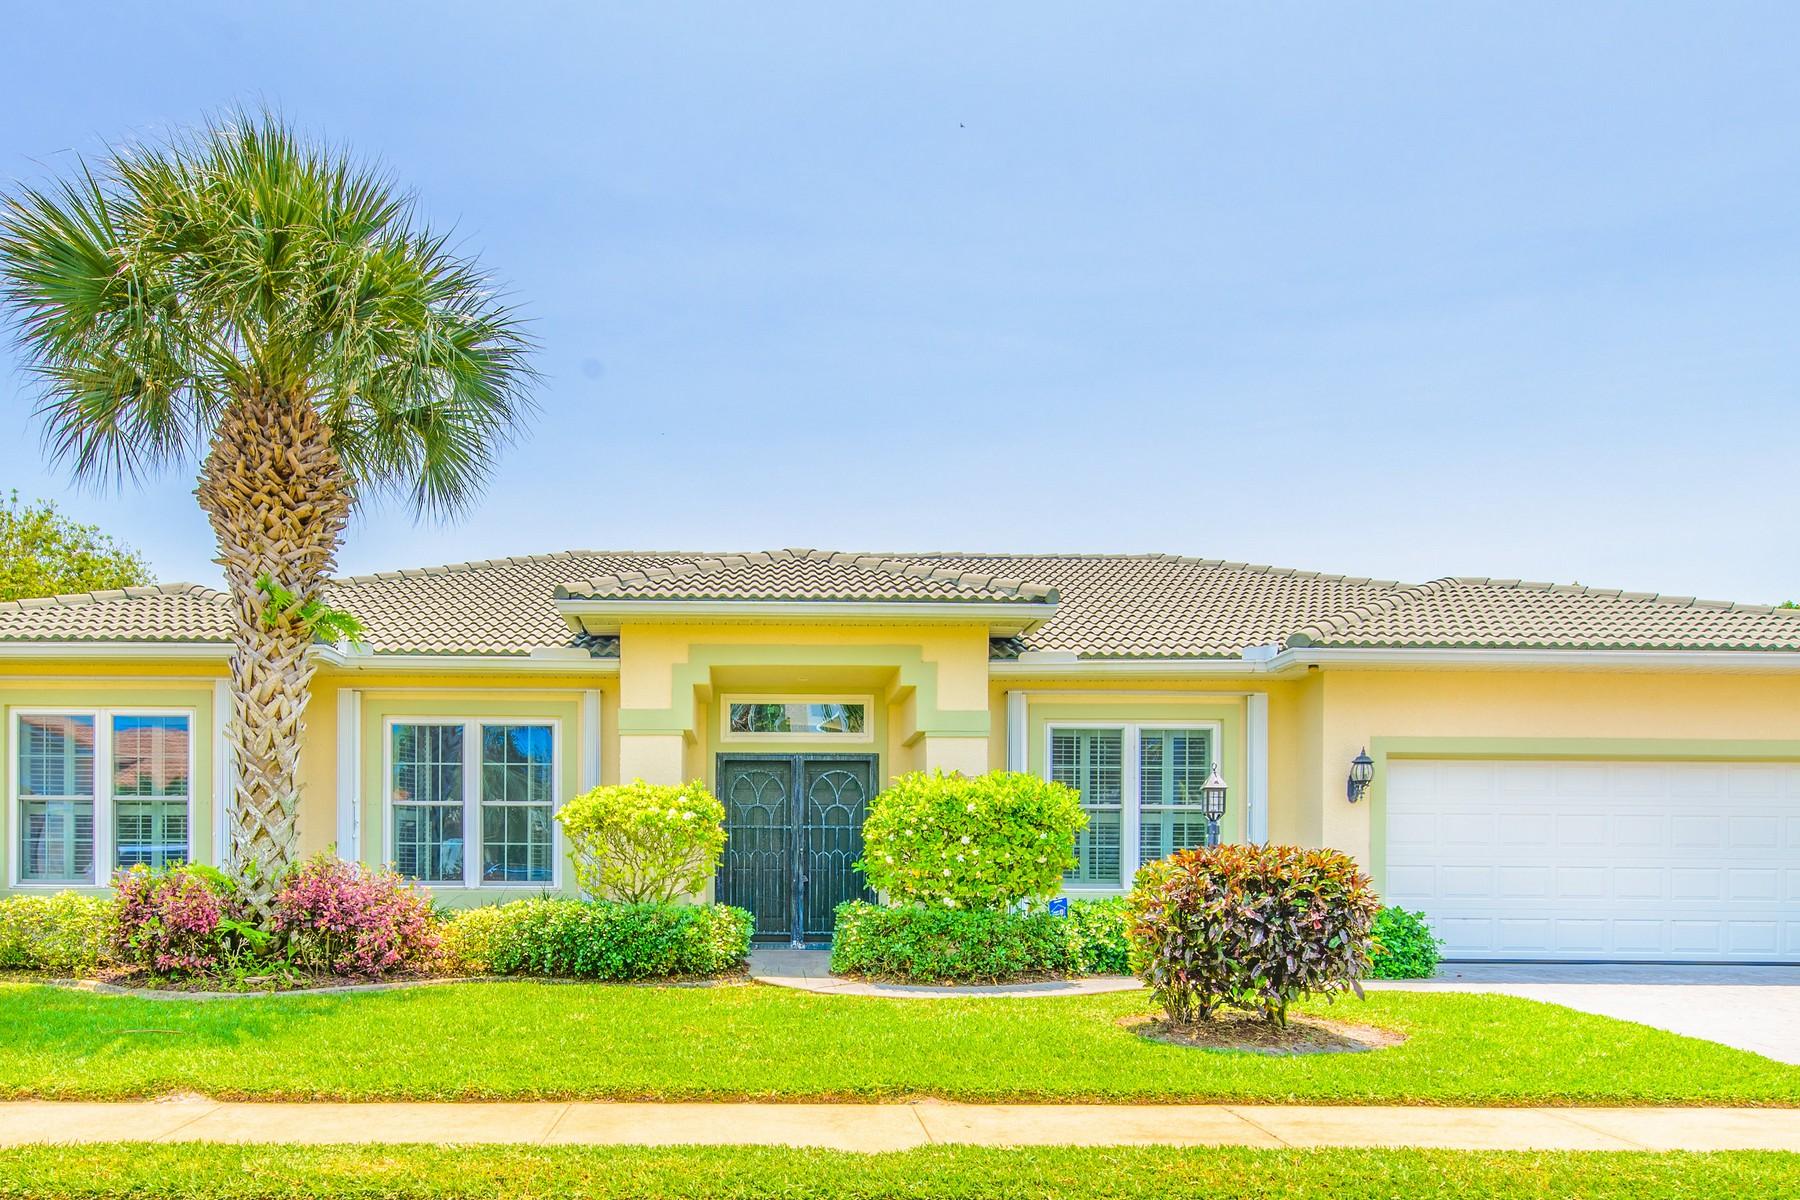 Single Family Home for Sale at Ocean Ridge 241 Ocean Ridge Drive Melbourne Beach, Florida, 32951 United States